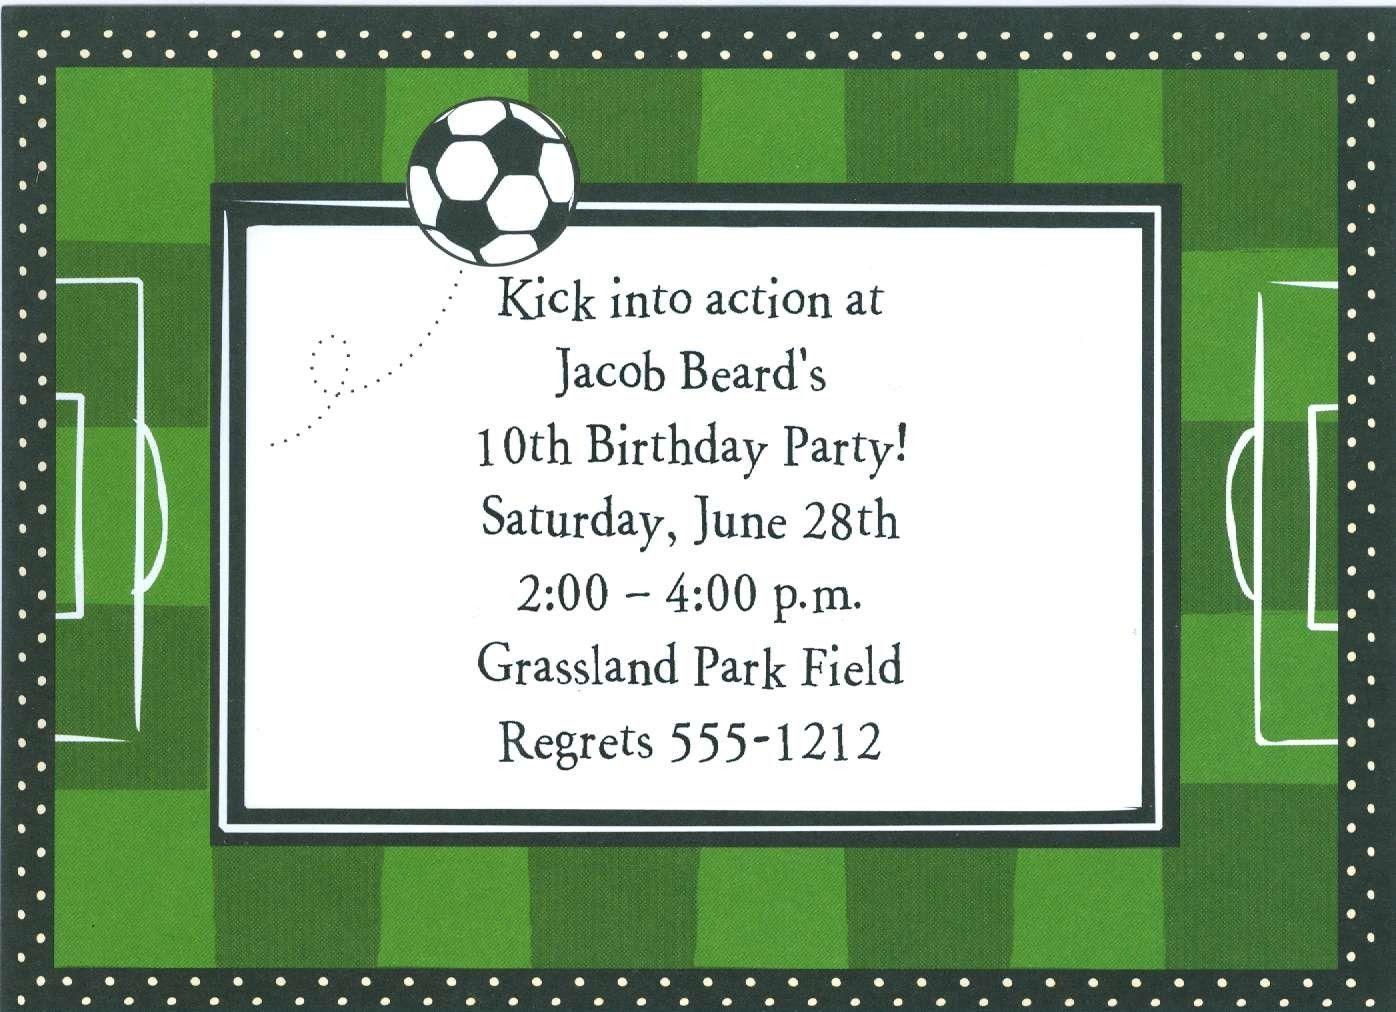 soccer party invitations sndclshcom - Soccer Party Invitations